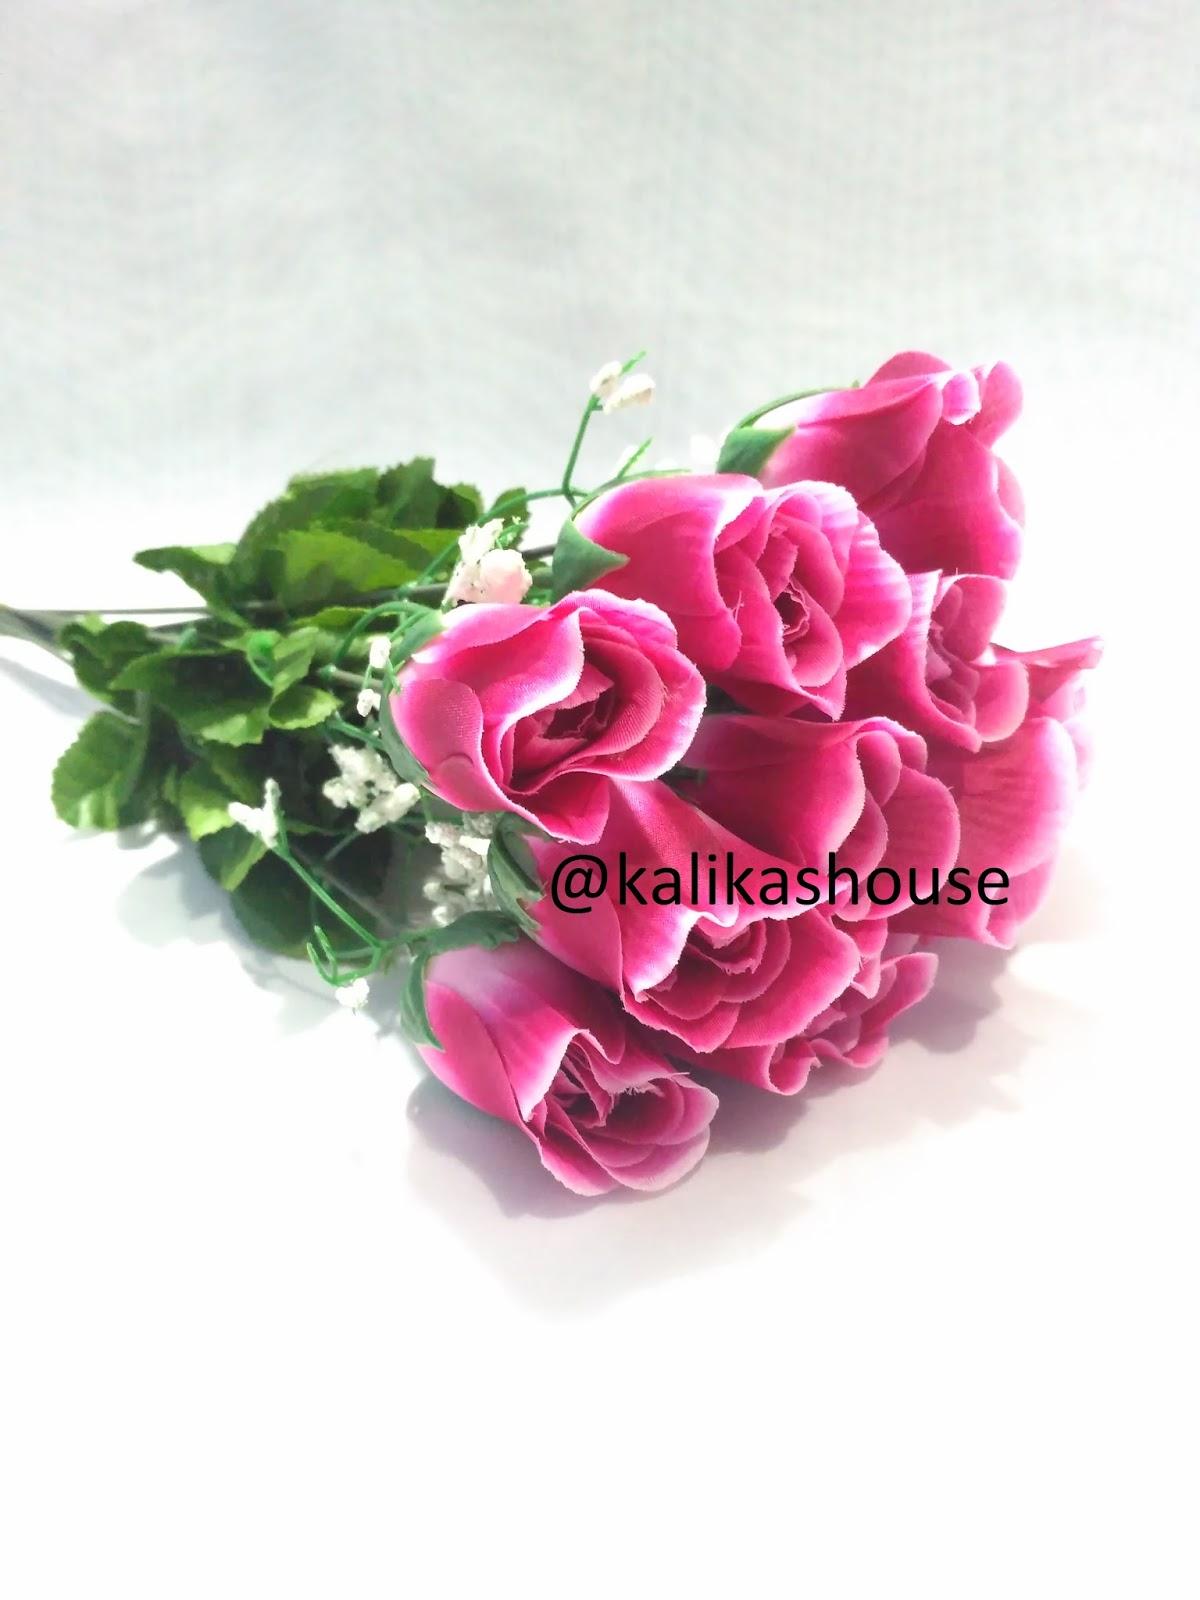 Bunga Mawar Kuncup Palsu Artificial Satuan dan Baby Breath  Bunga Hias 6ca3f26e05